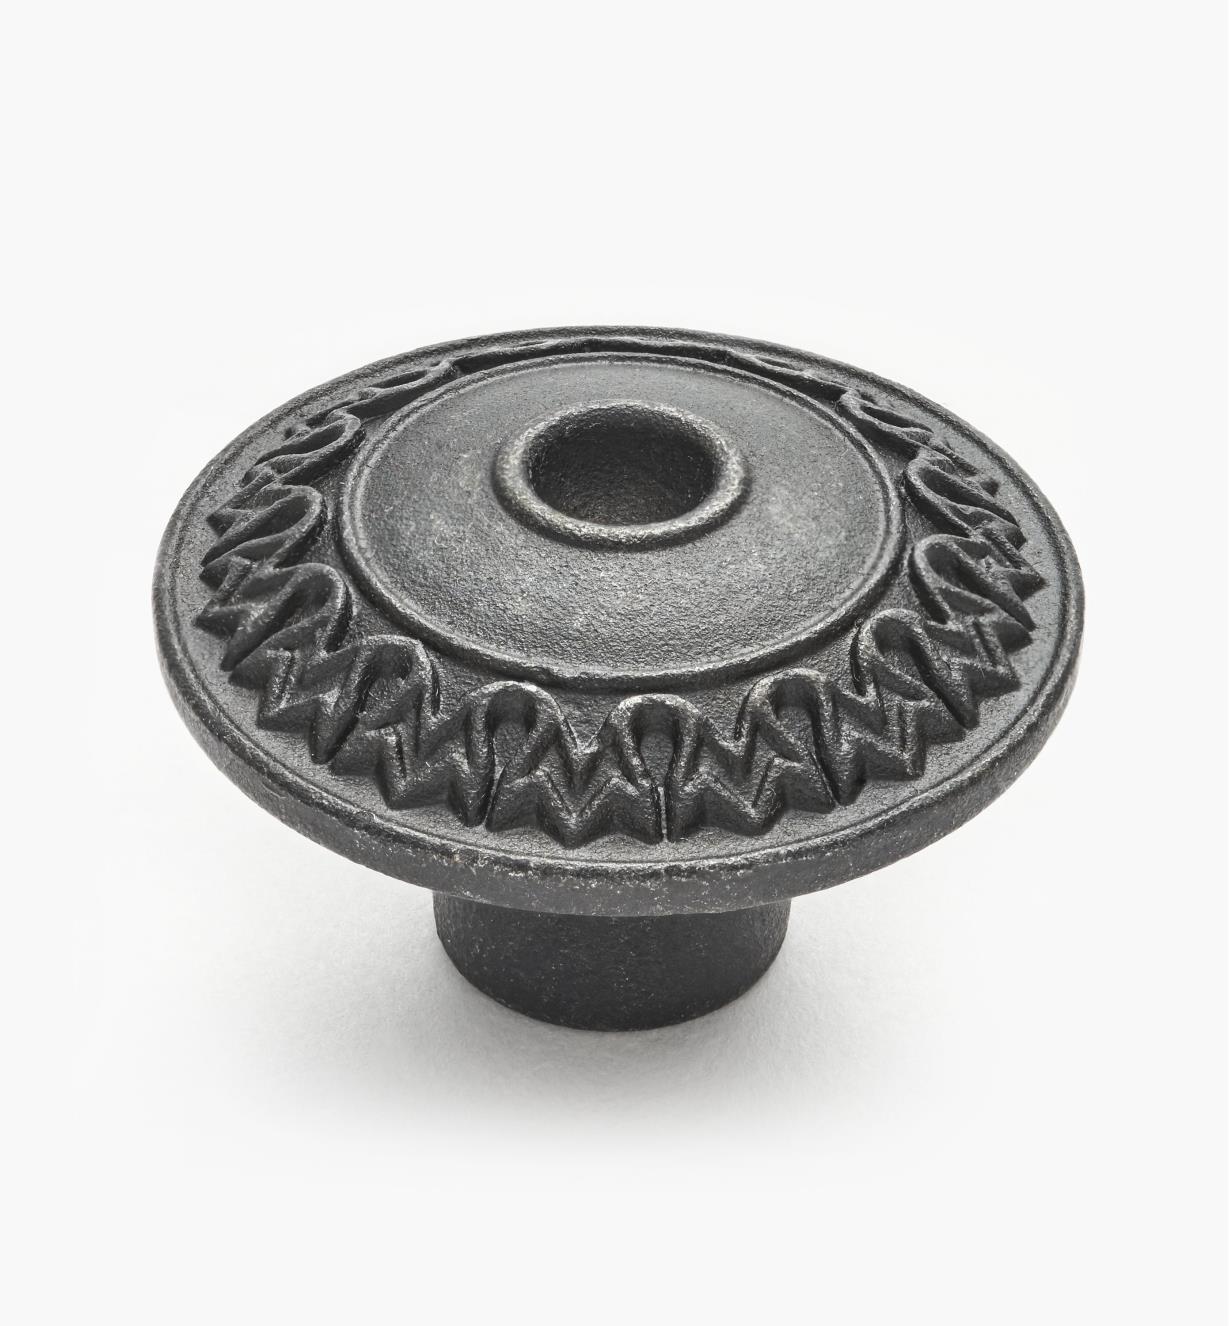 01W6140 - Steel Detailed Knob